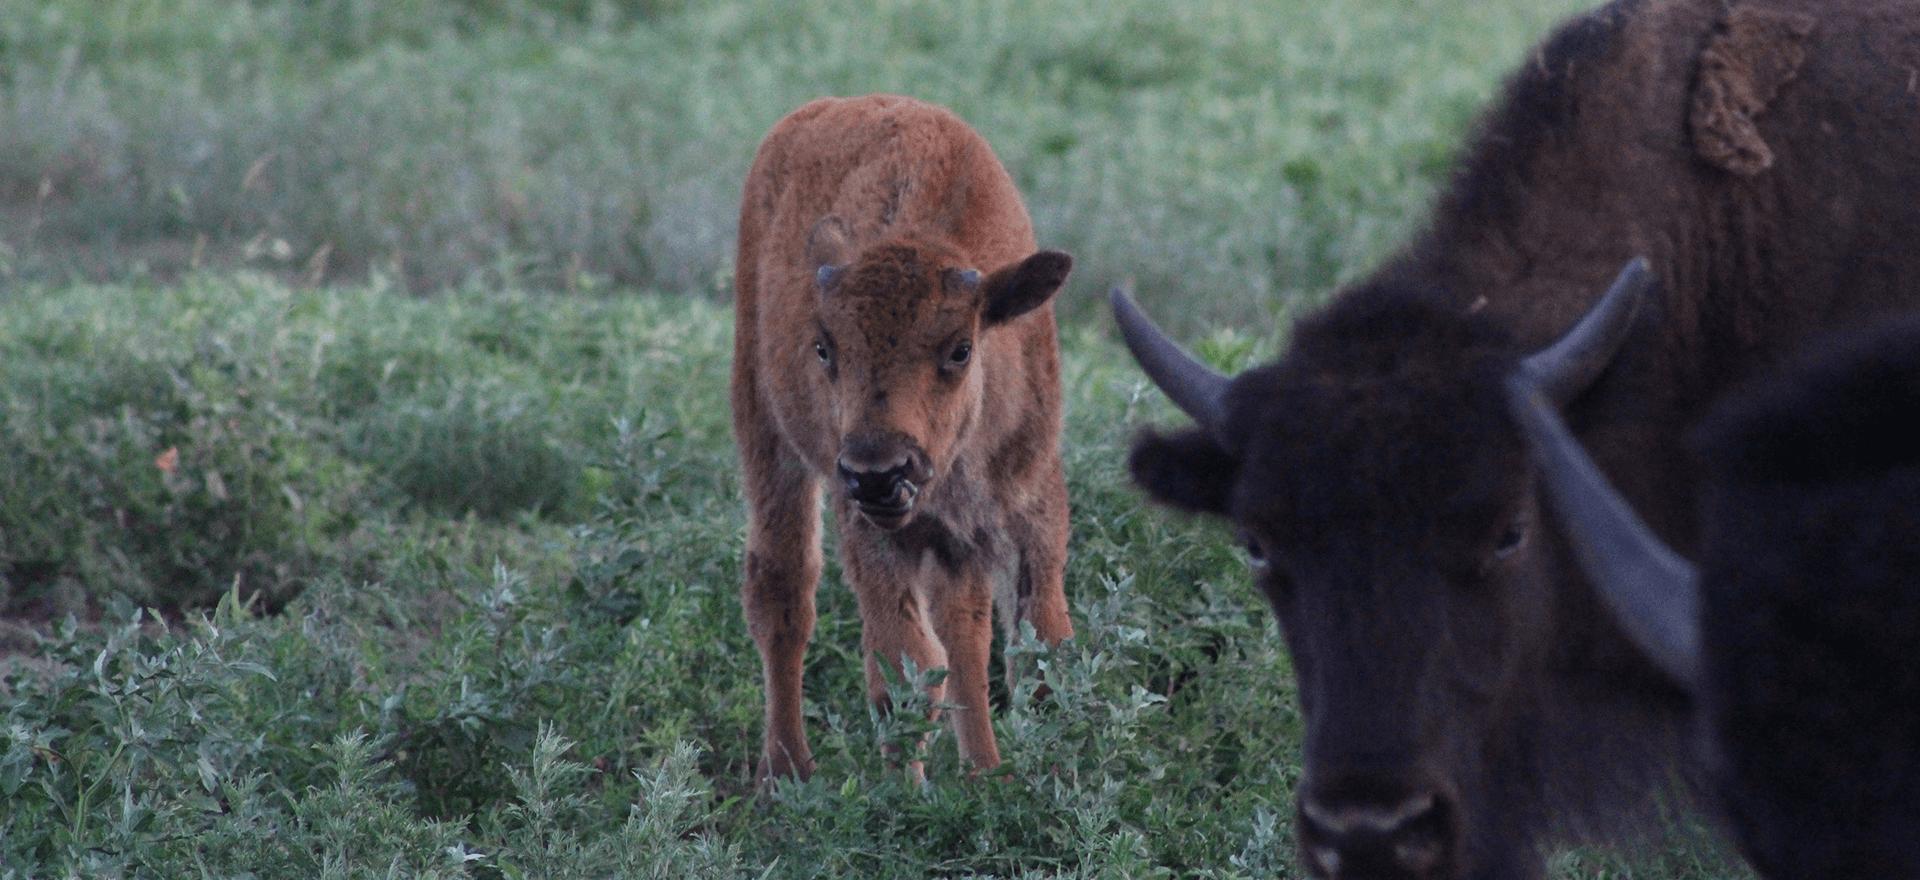 Bison generations